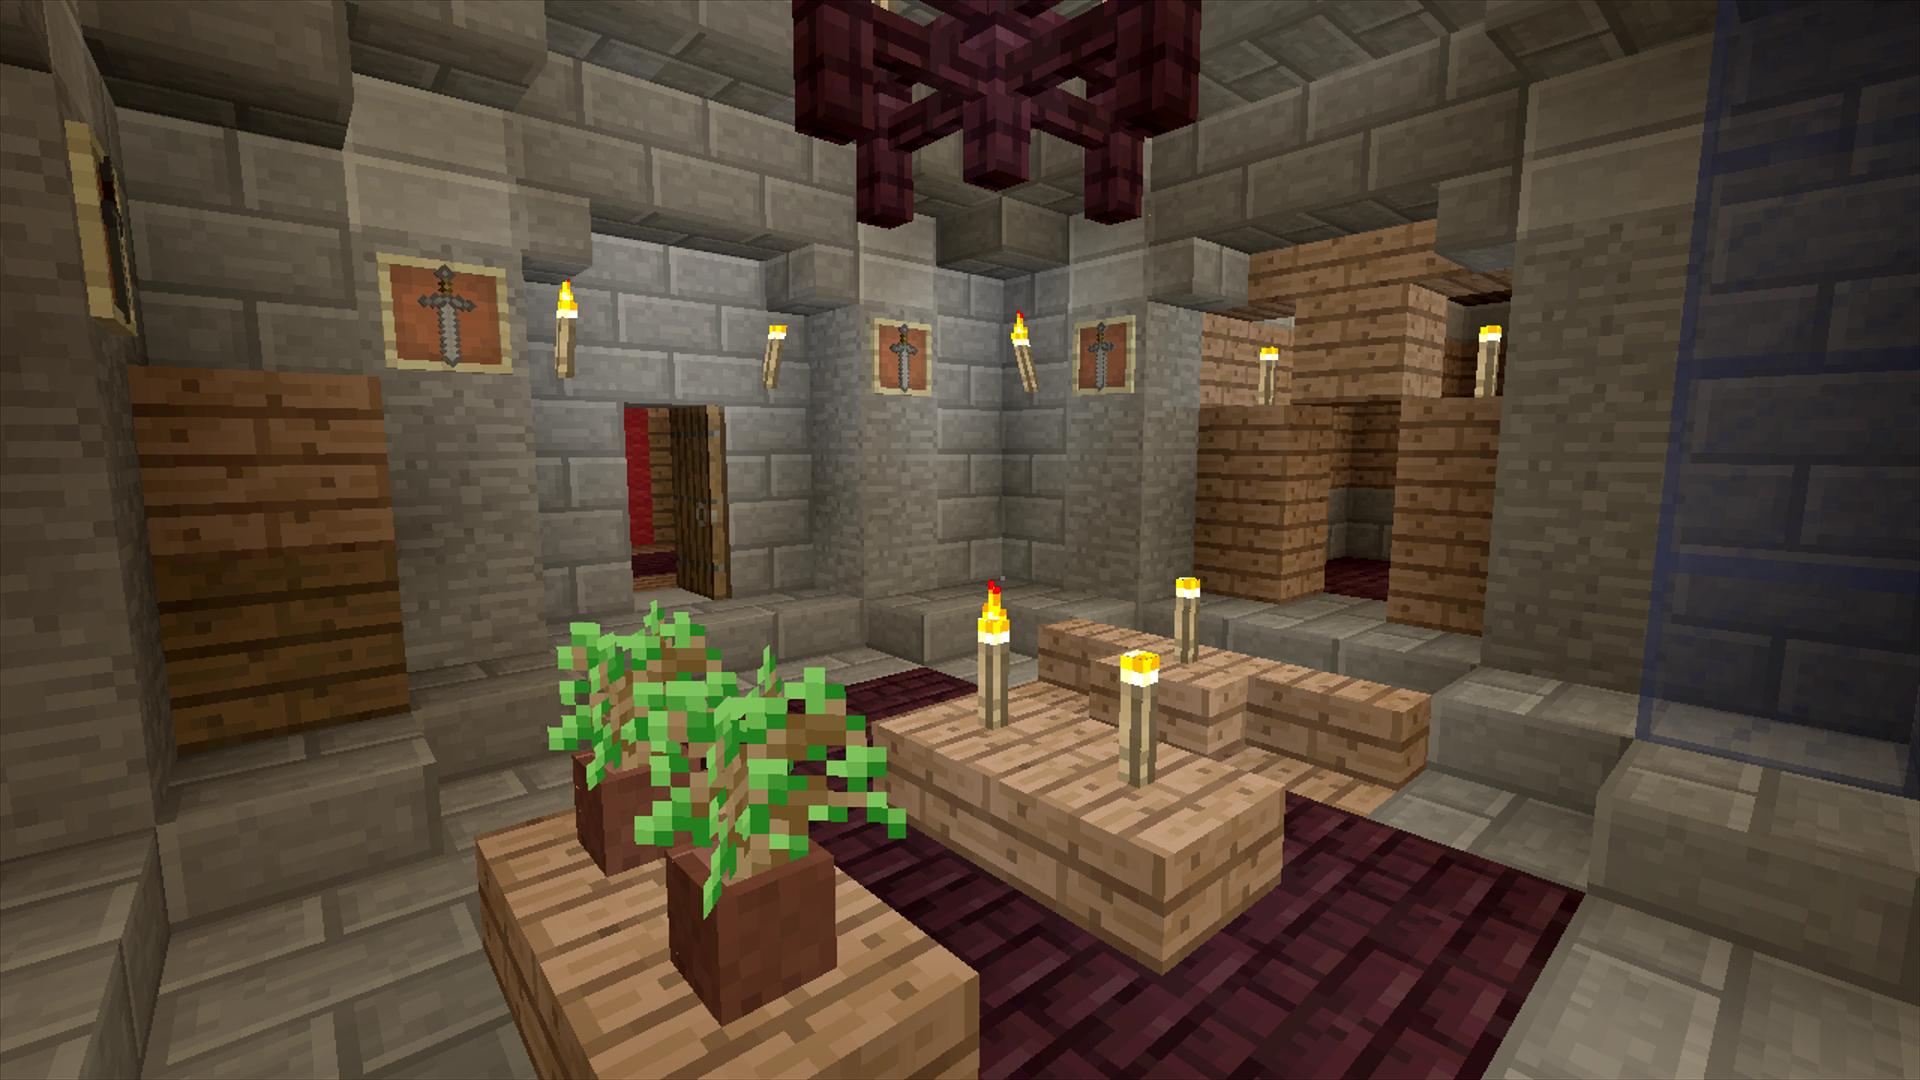 Minecraft Screen Shot 2-16-19, 1.47 PM.png